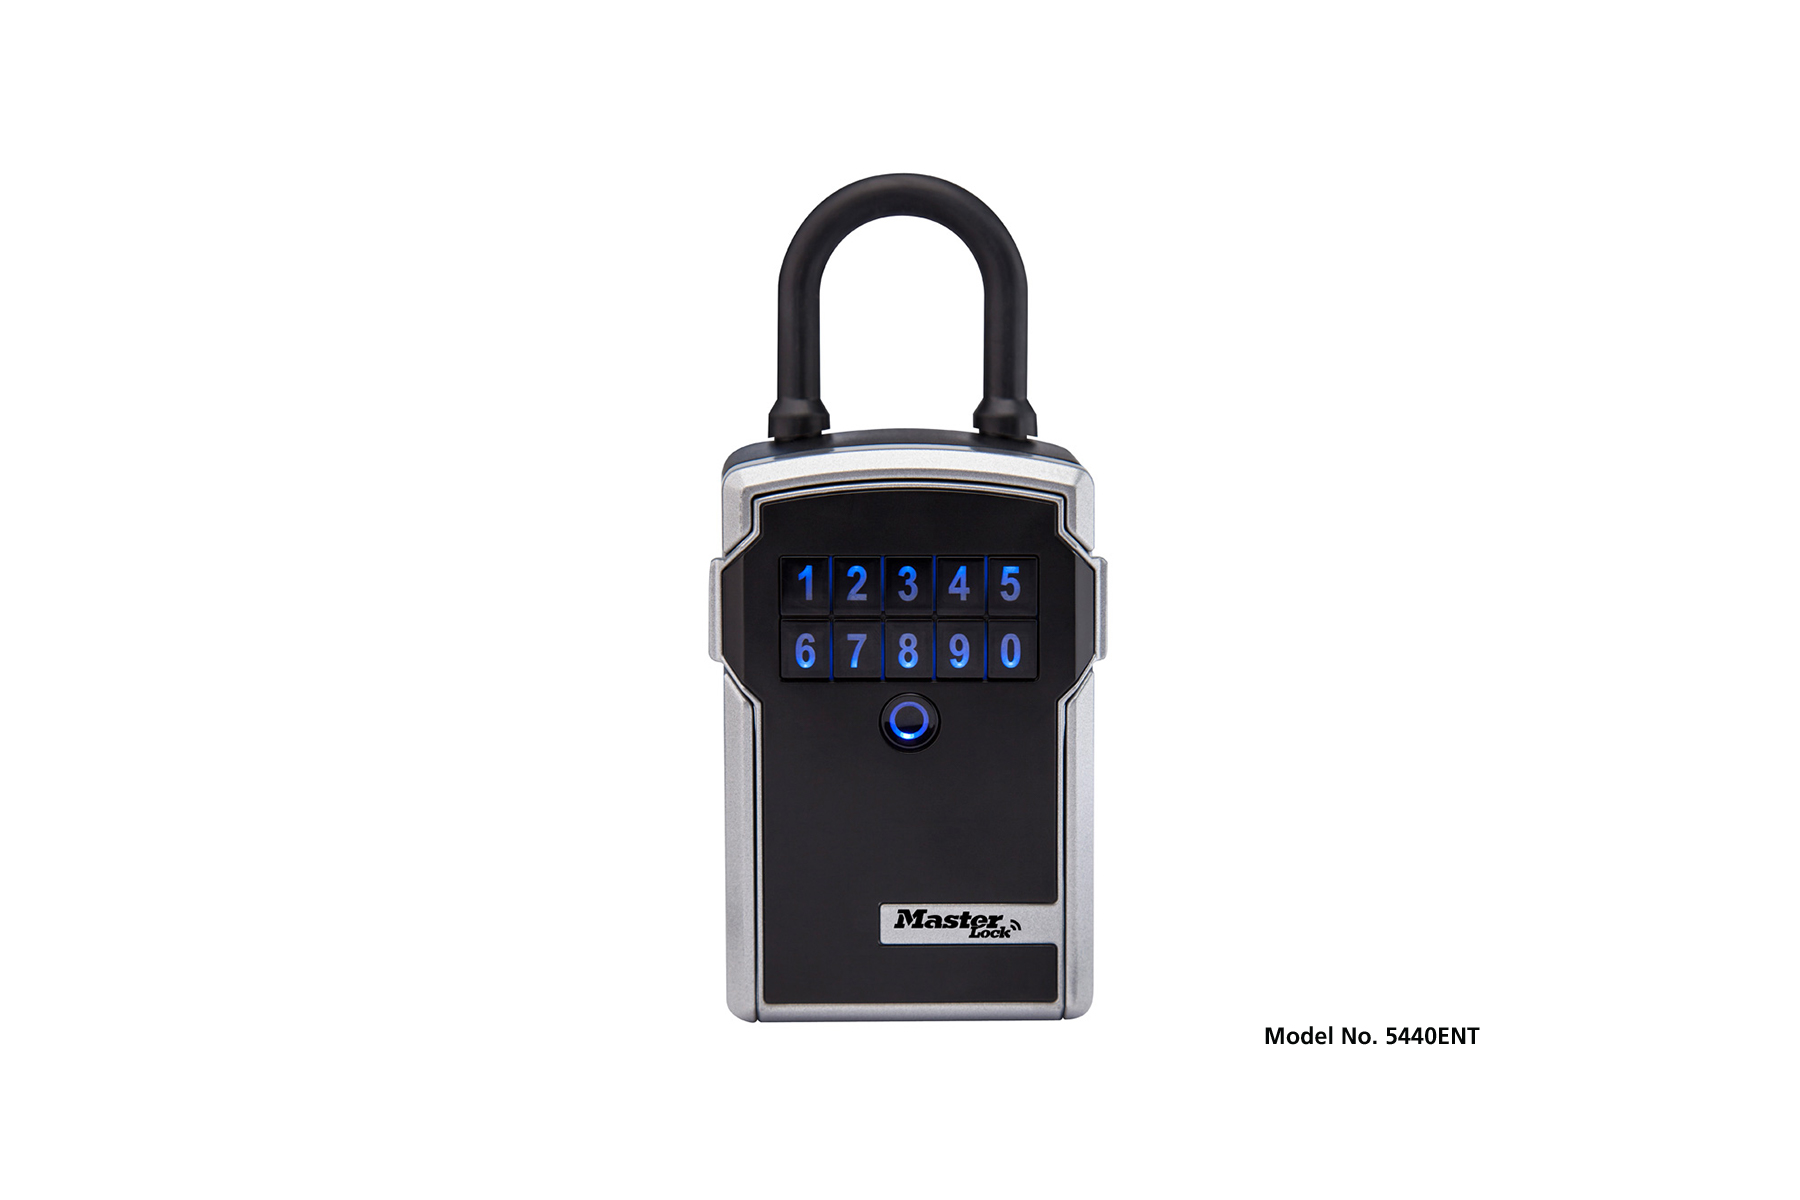 Master Lock Model No. 5440ENT